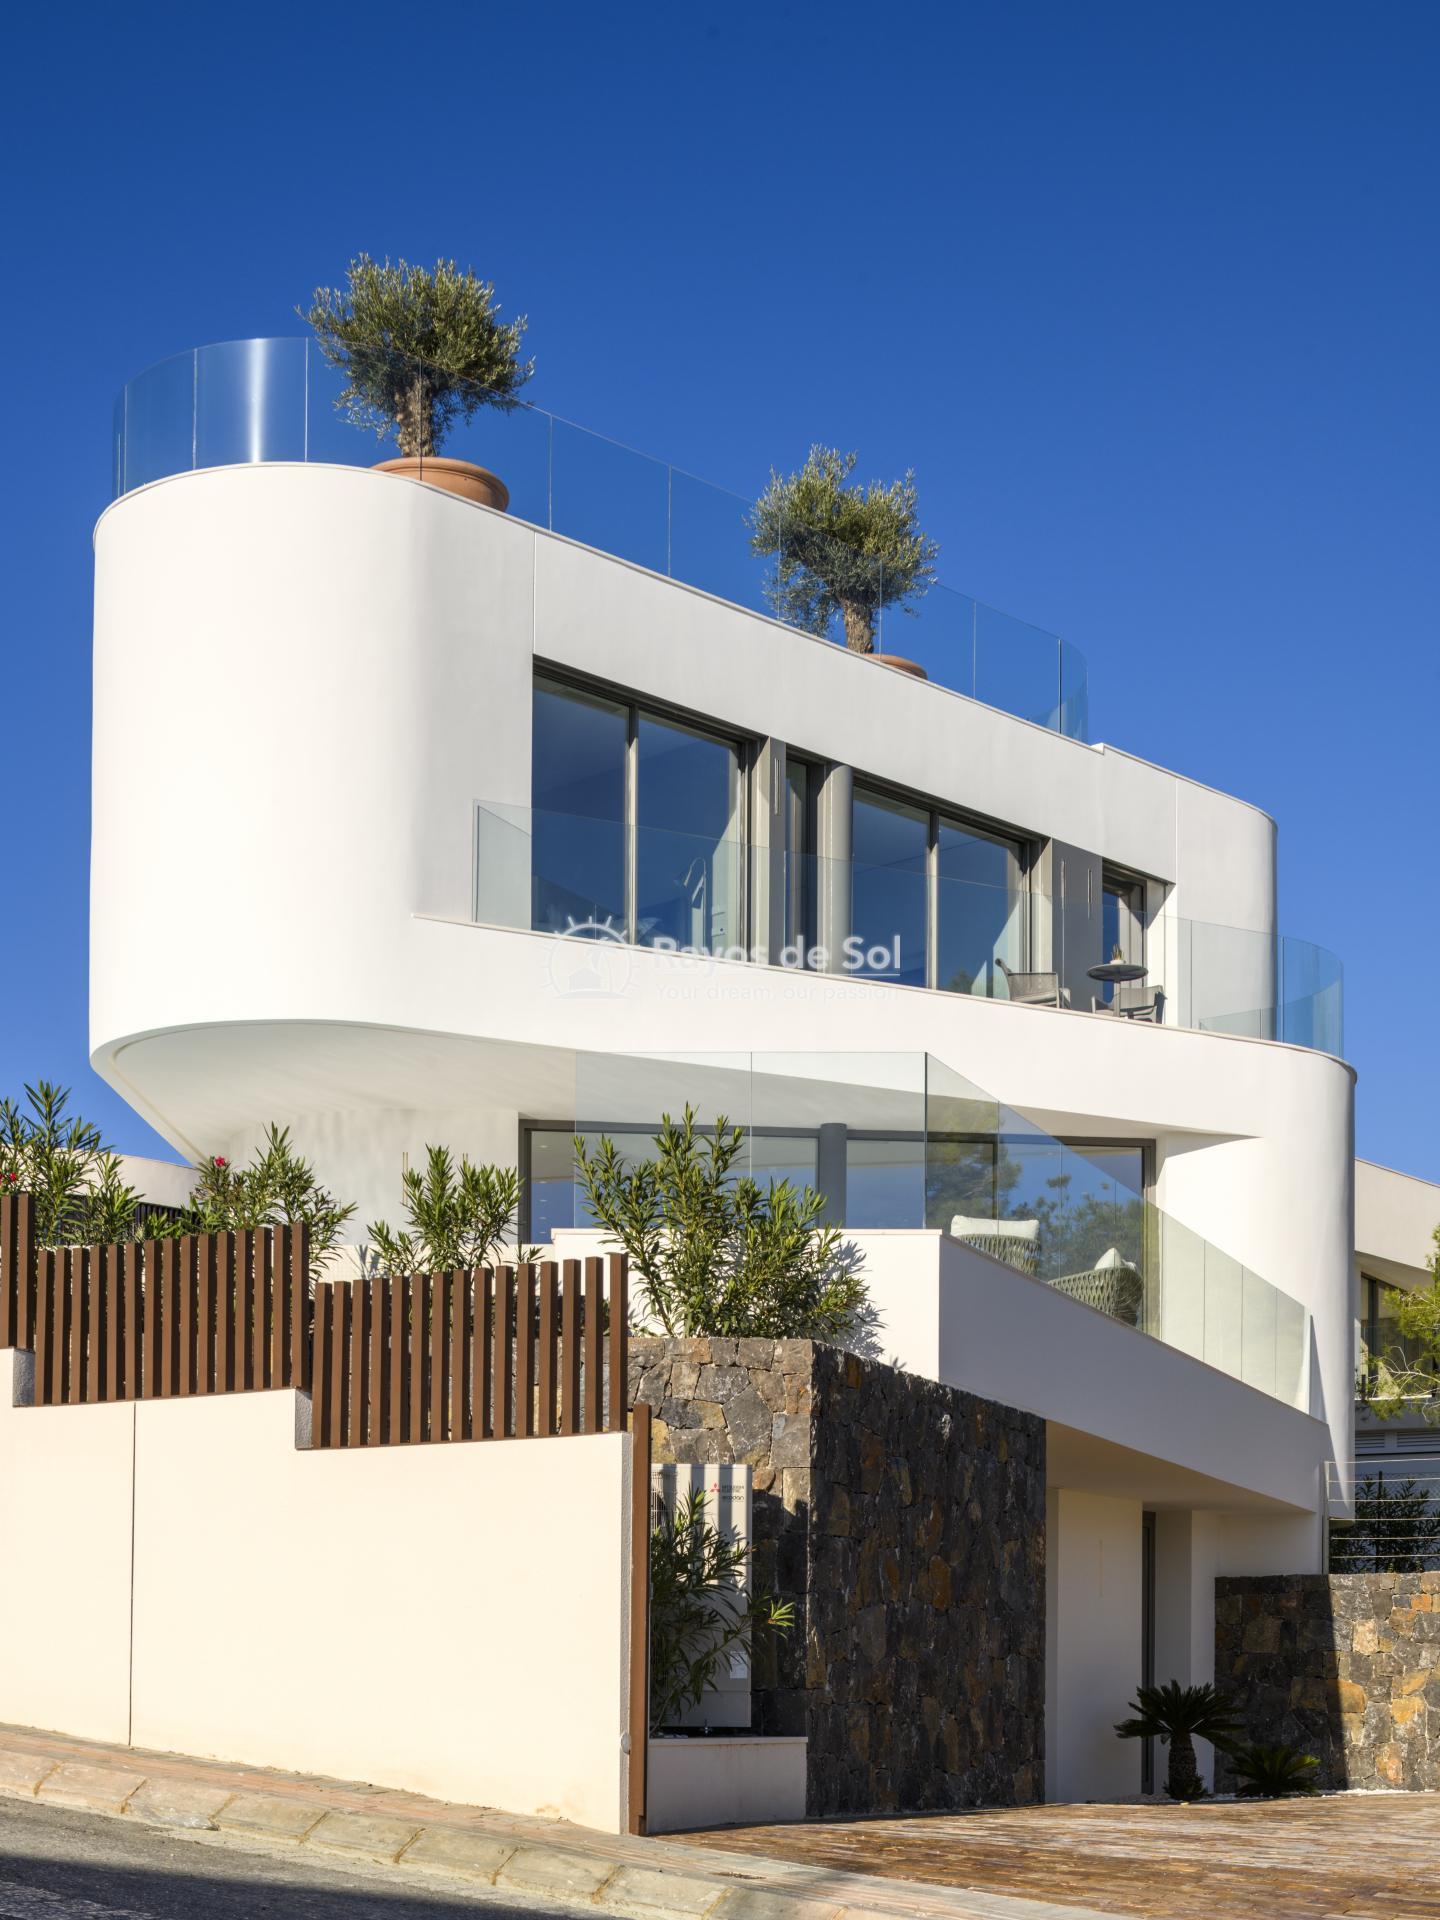 Stunning modern design villa  in Sierra Cortina, Finestrat, Costa Blanca (Praga 19) - 64